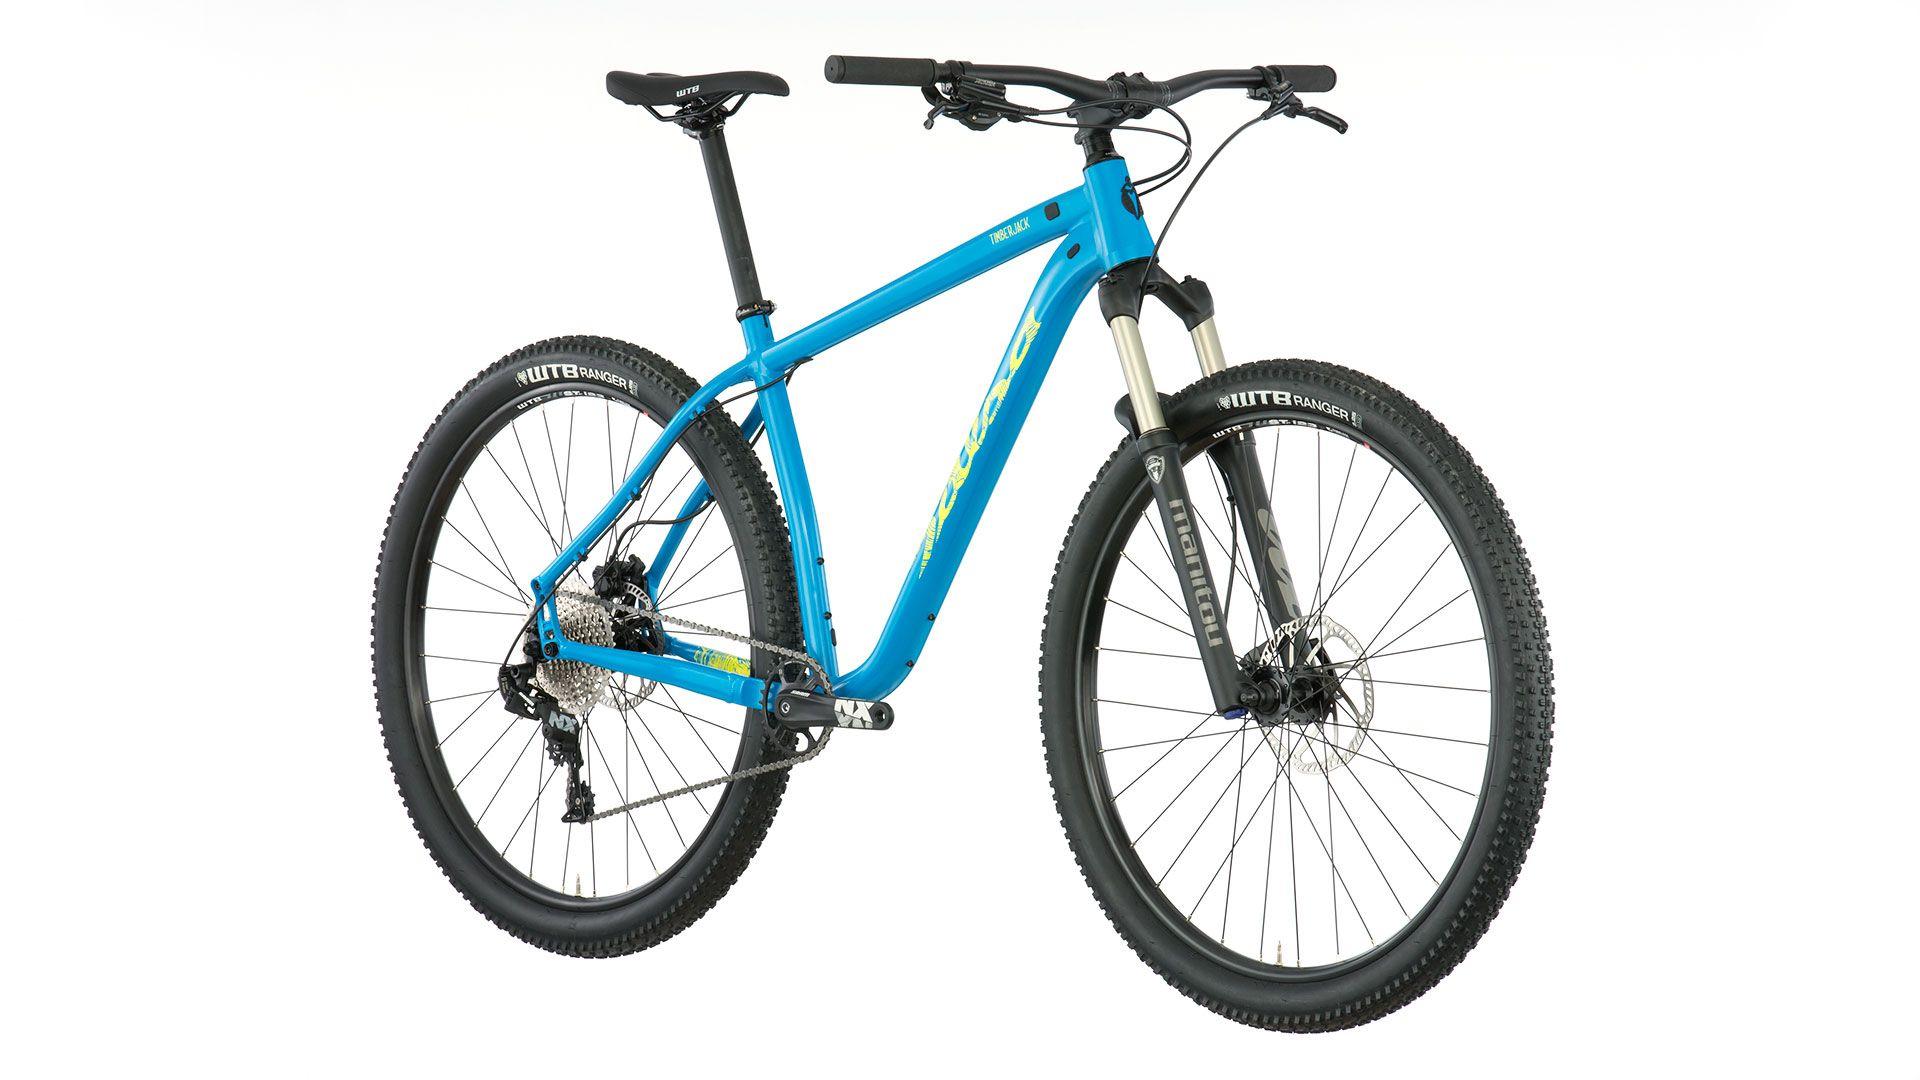 Salsa Cycles Timberjack Nx1 29 Best Mountain Bikes